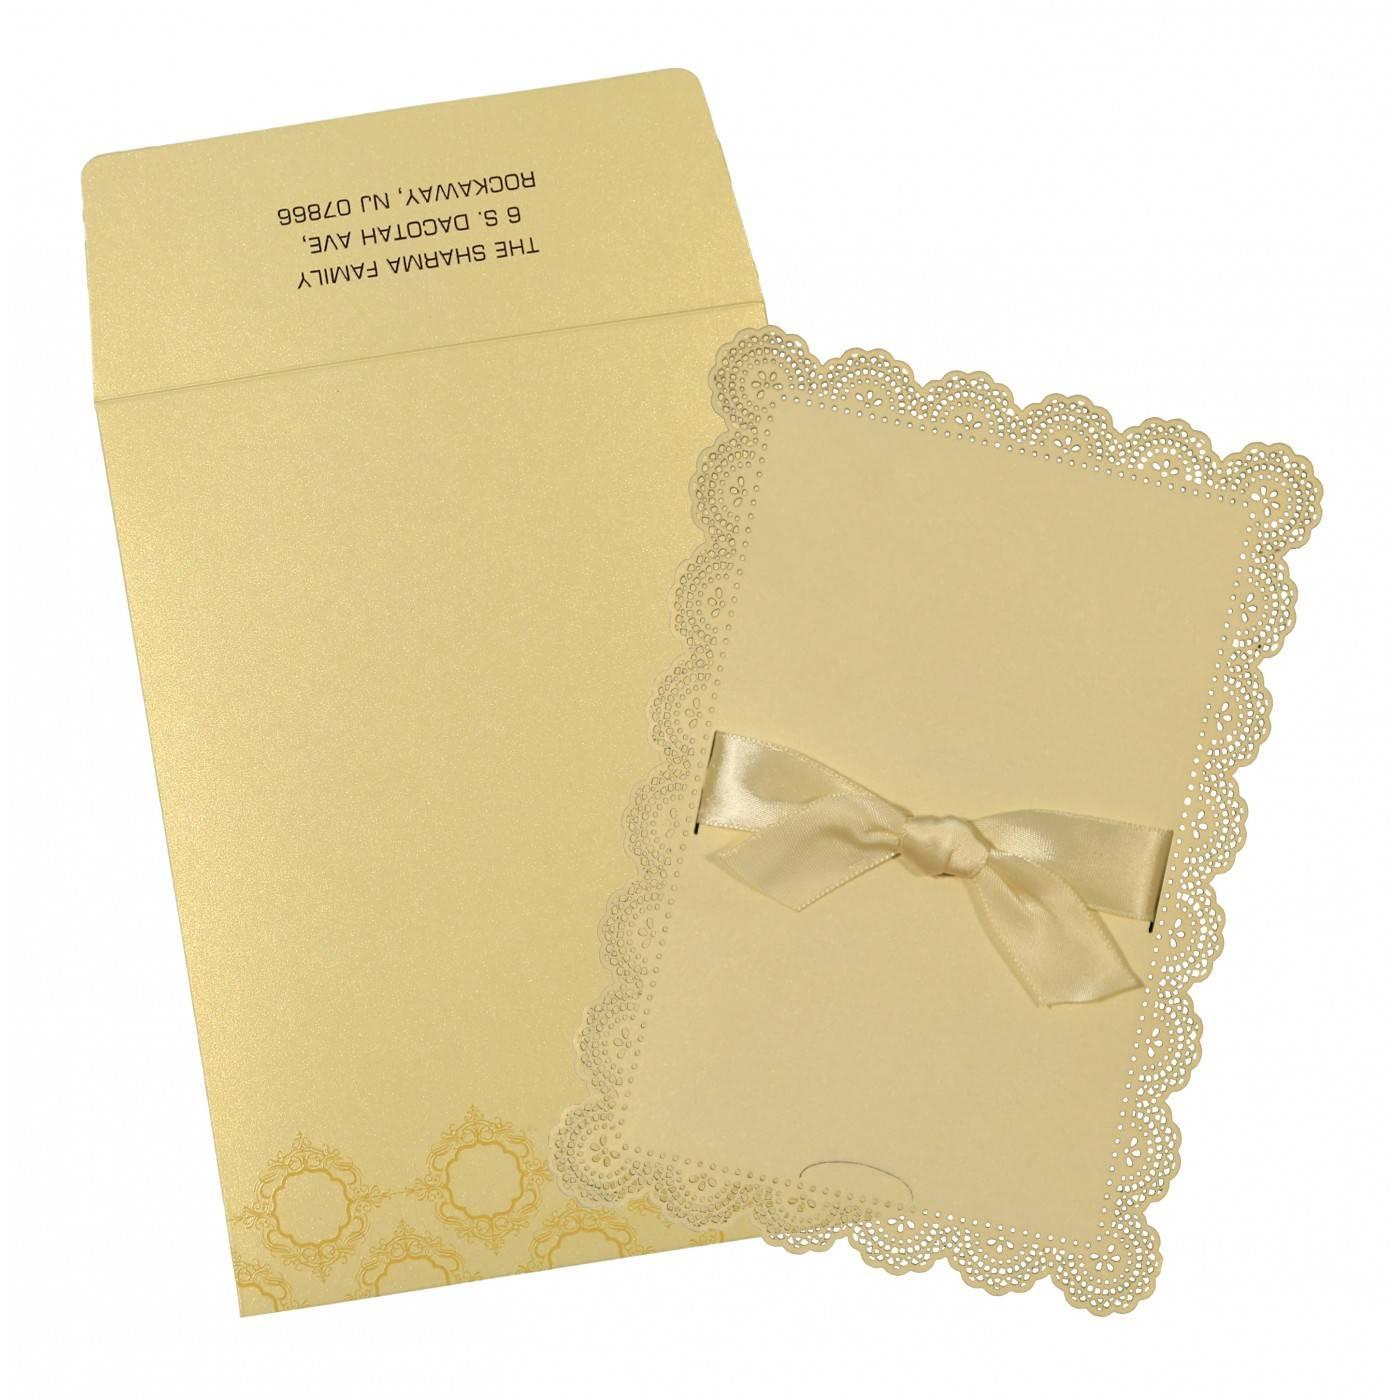 IVORY SHIMMERY LASER CUT WEDDING INVITATION : CW-1588 - IndianWeddingCards